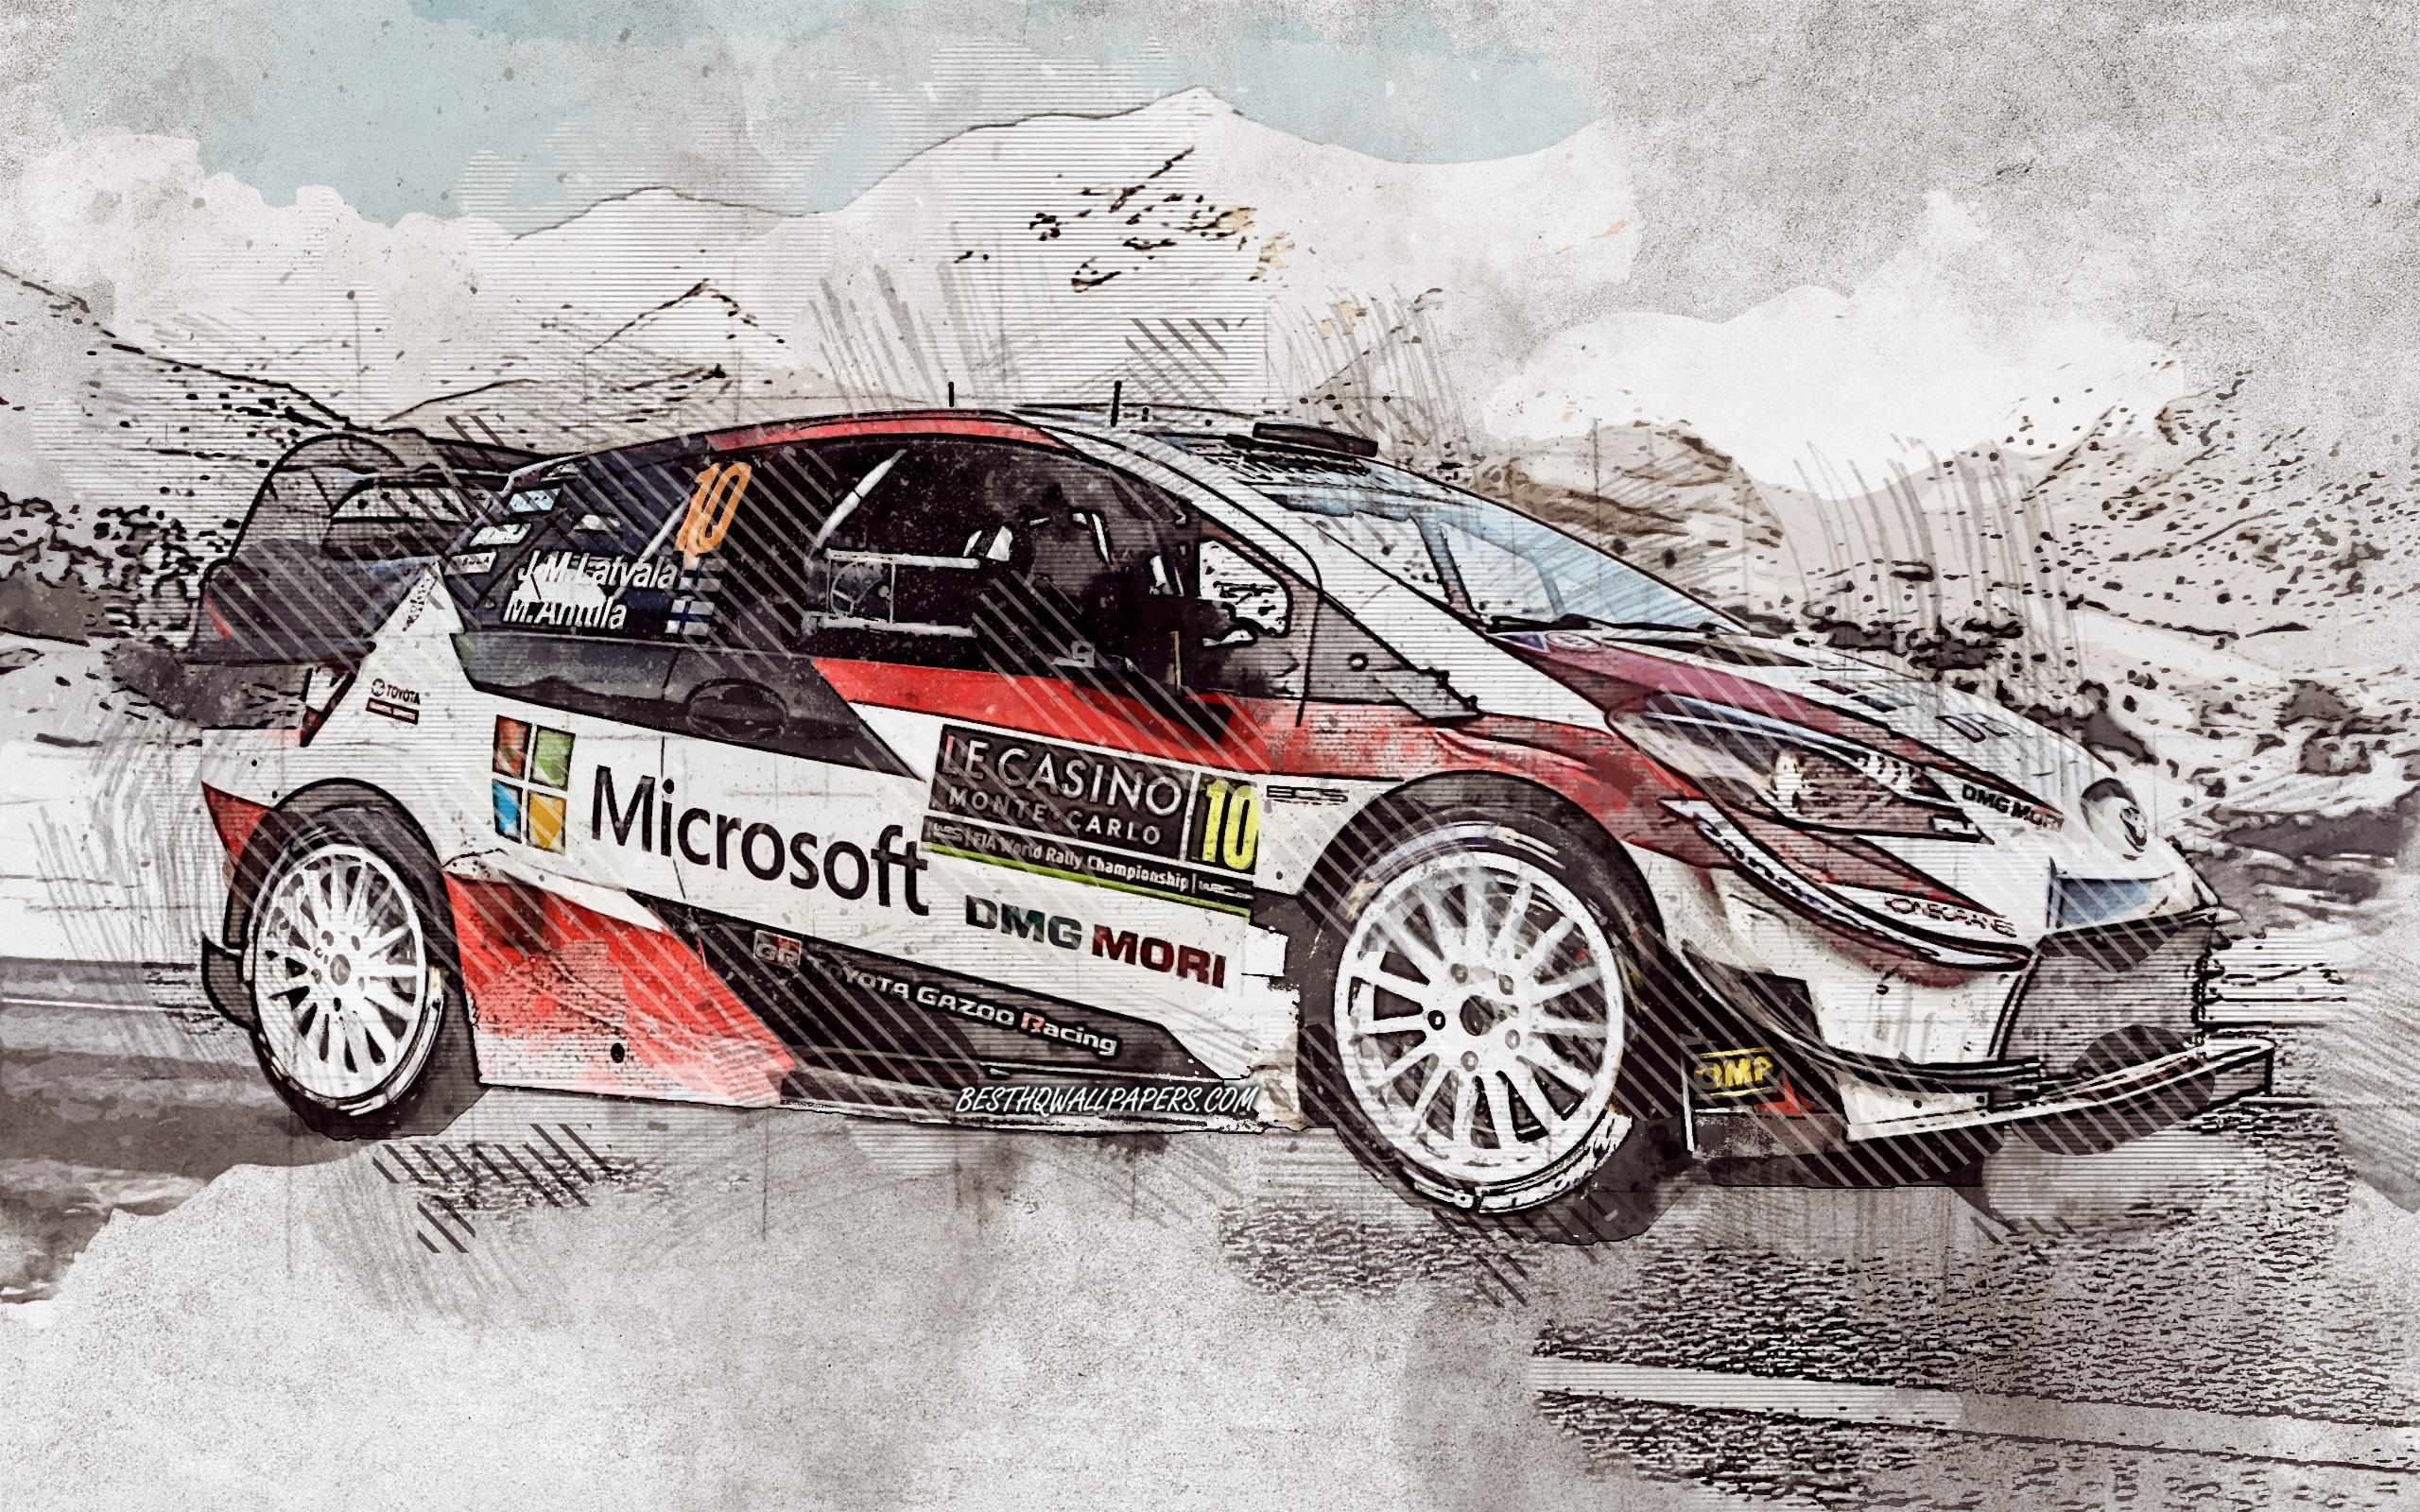 Jari-matti Latvala, Toyota Yaris Wrc, Finnish Rally - Toyota Yaris Rally Hd - HD Wallpaper